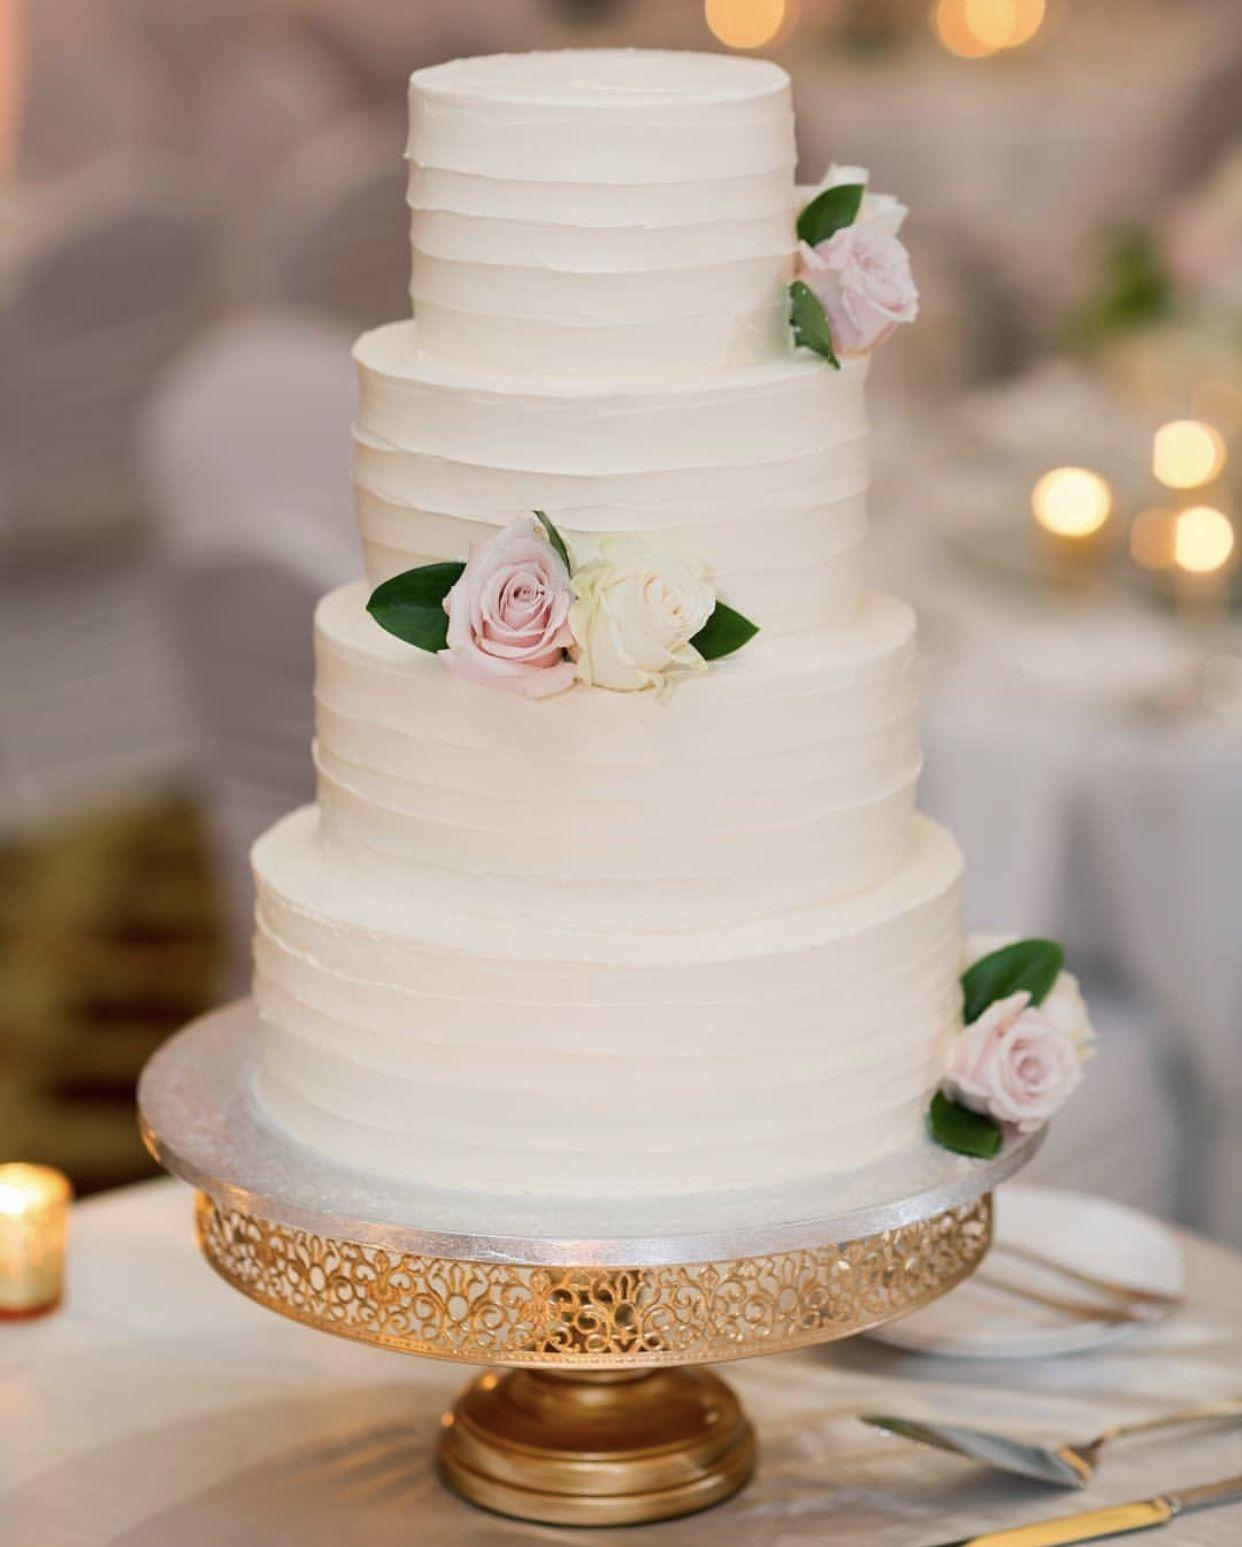 Wedding Cake By Market Street Wedding Catering Cost Wedding Cake Photos Wedding Cake Toppers